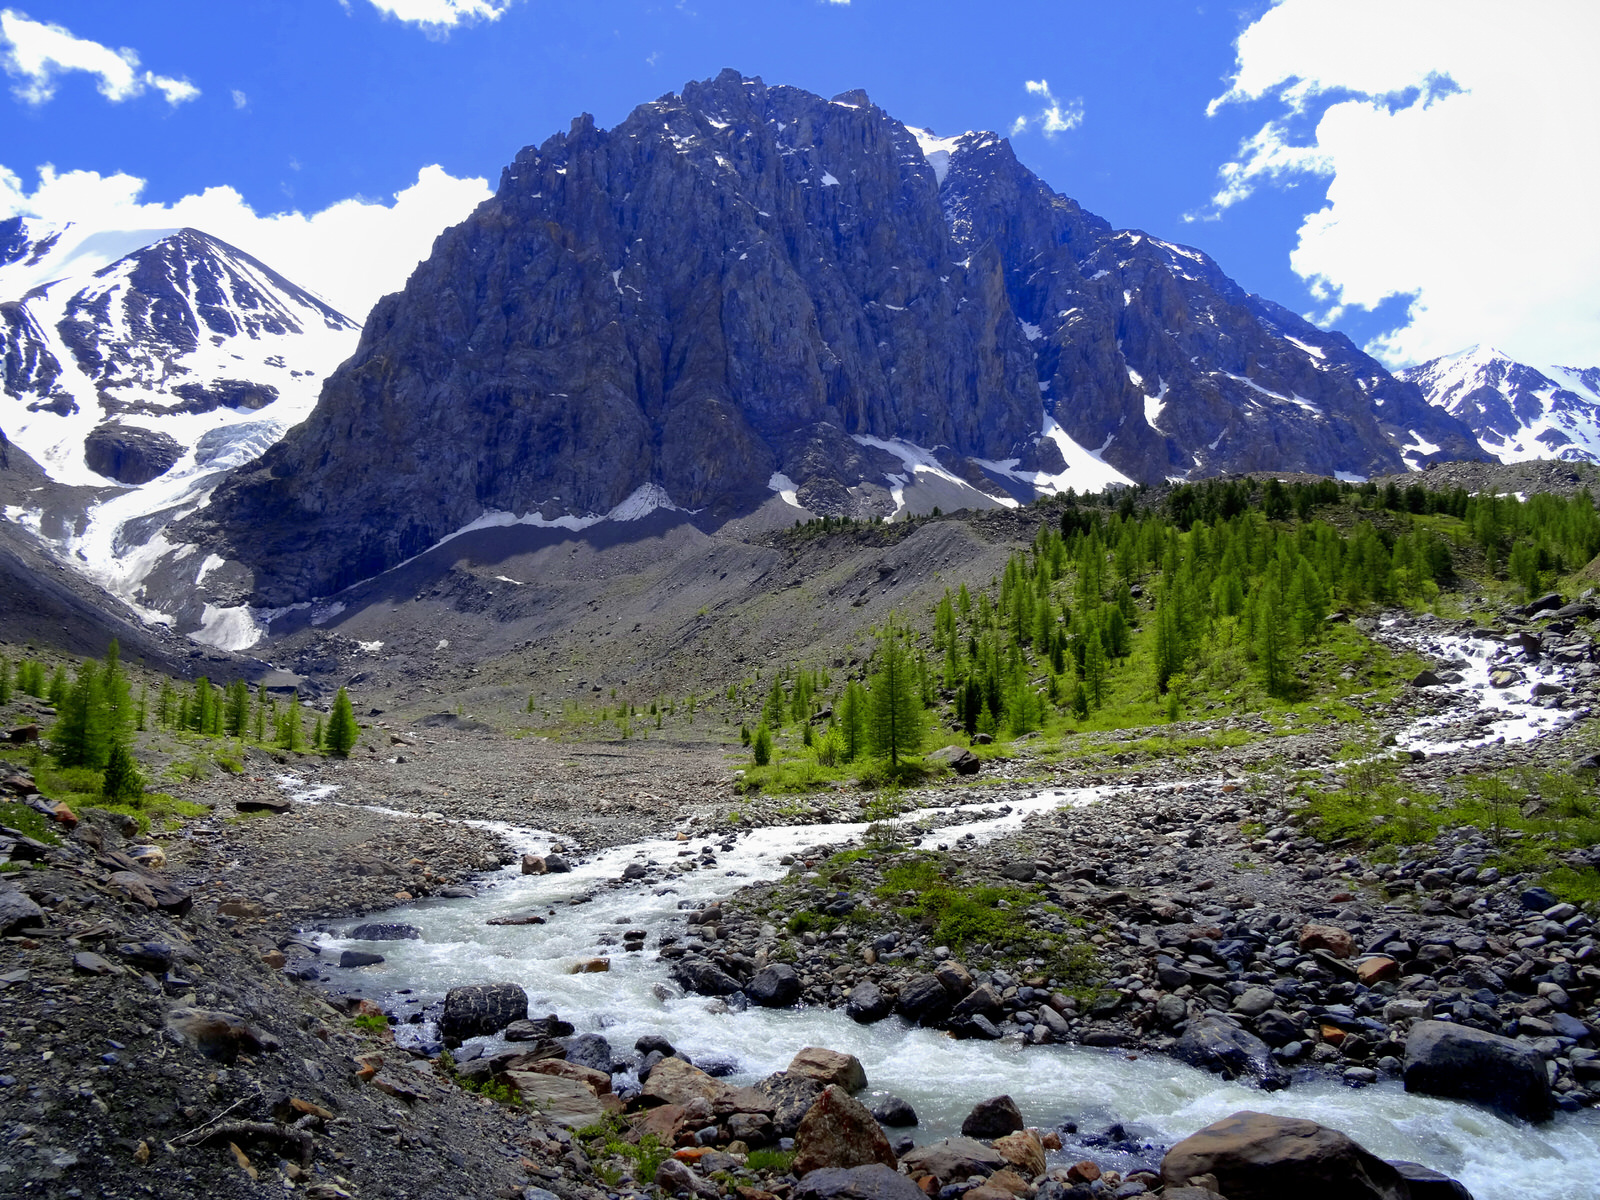 Montes de altai